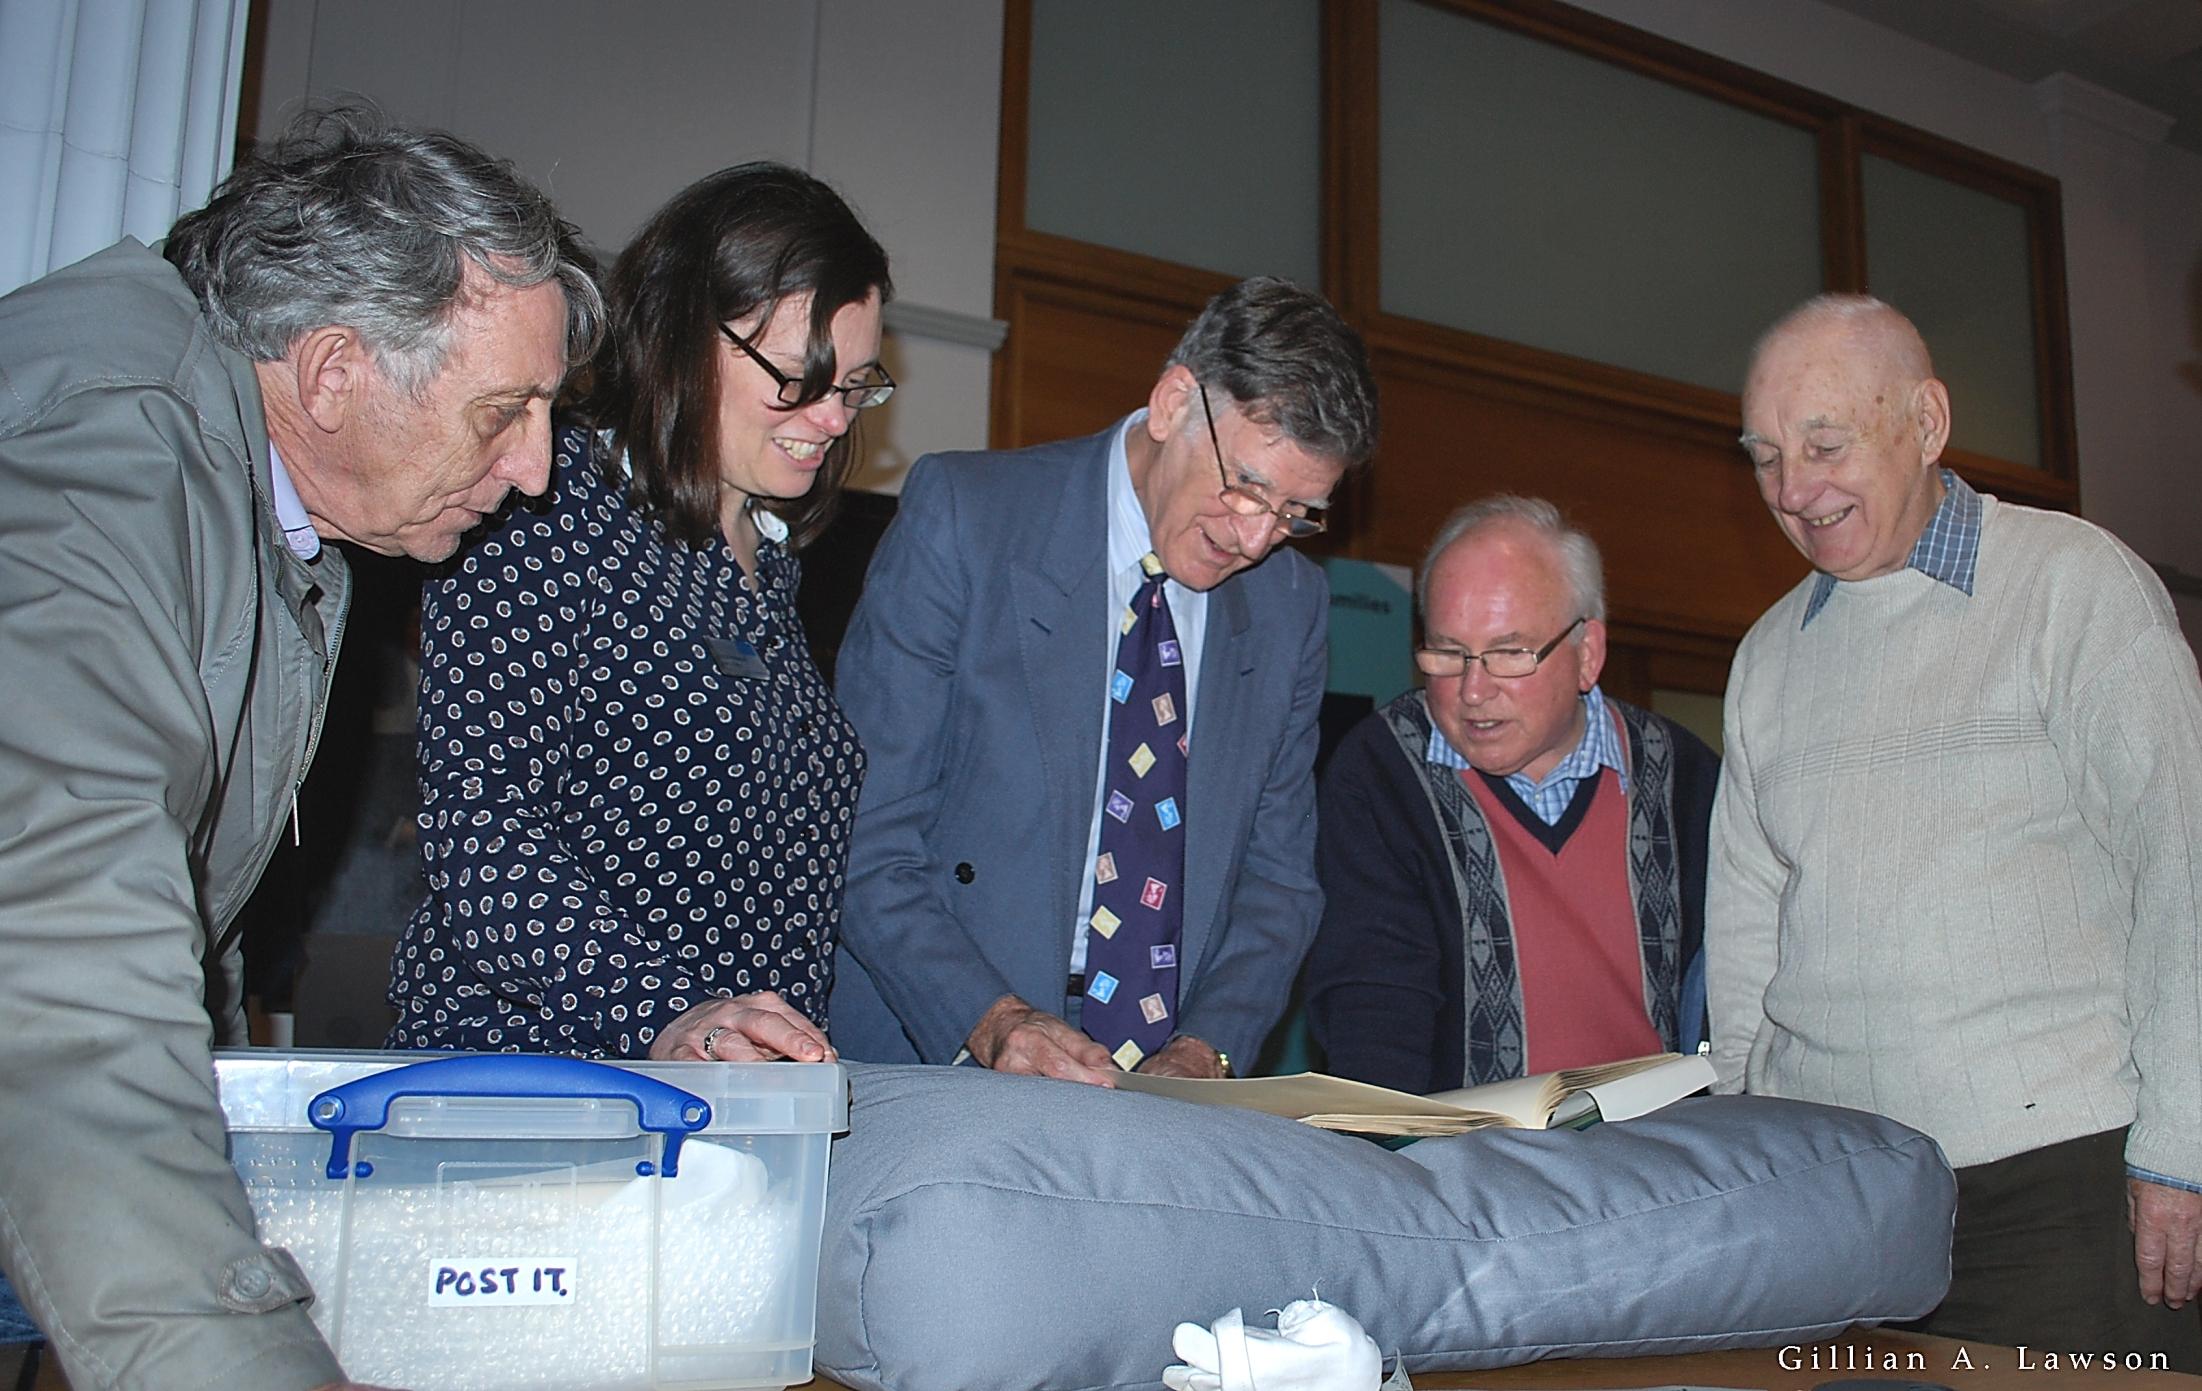 Paul Gaywood, Emma Heslewood & Members Of The Philatelic Society